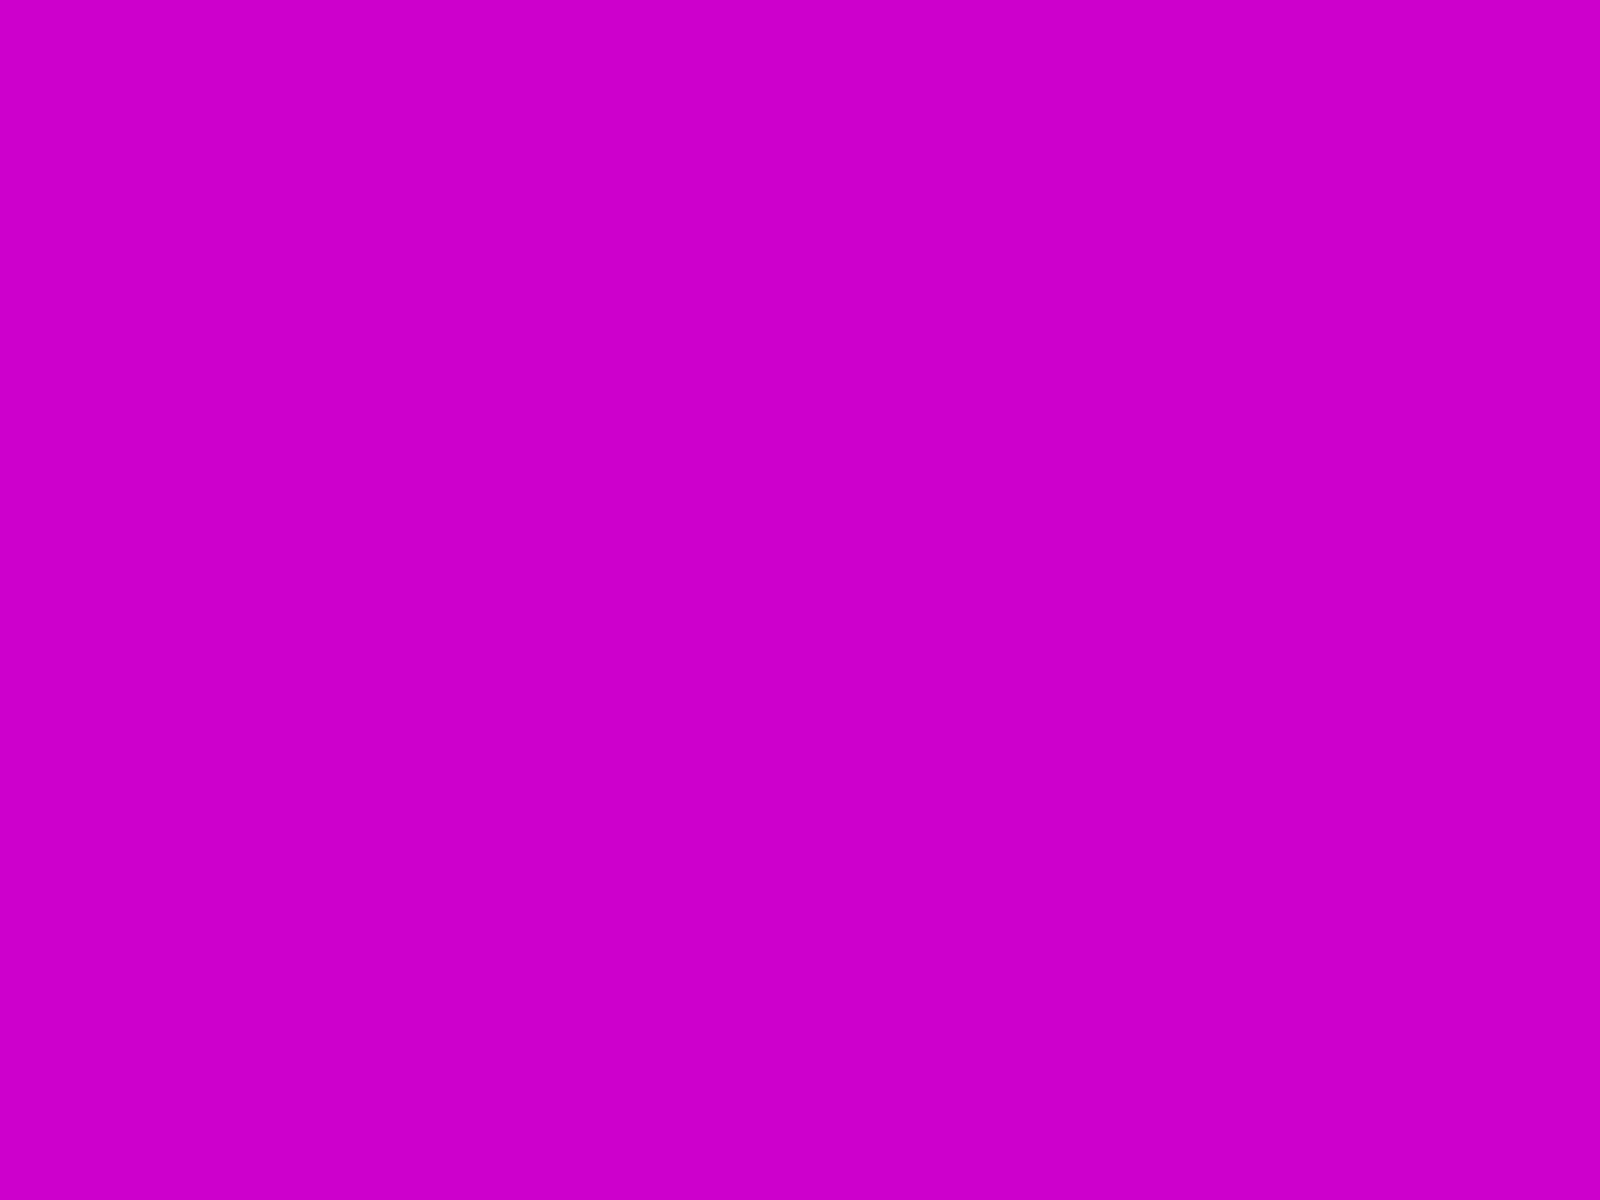 1600x1200 Deep Magenta Solid Color Background